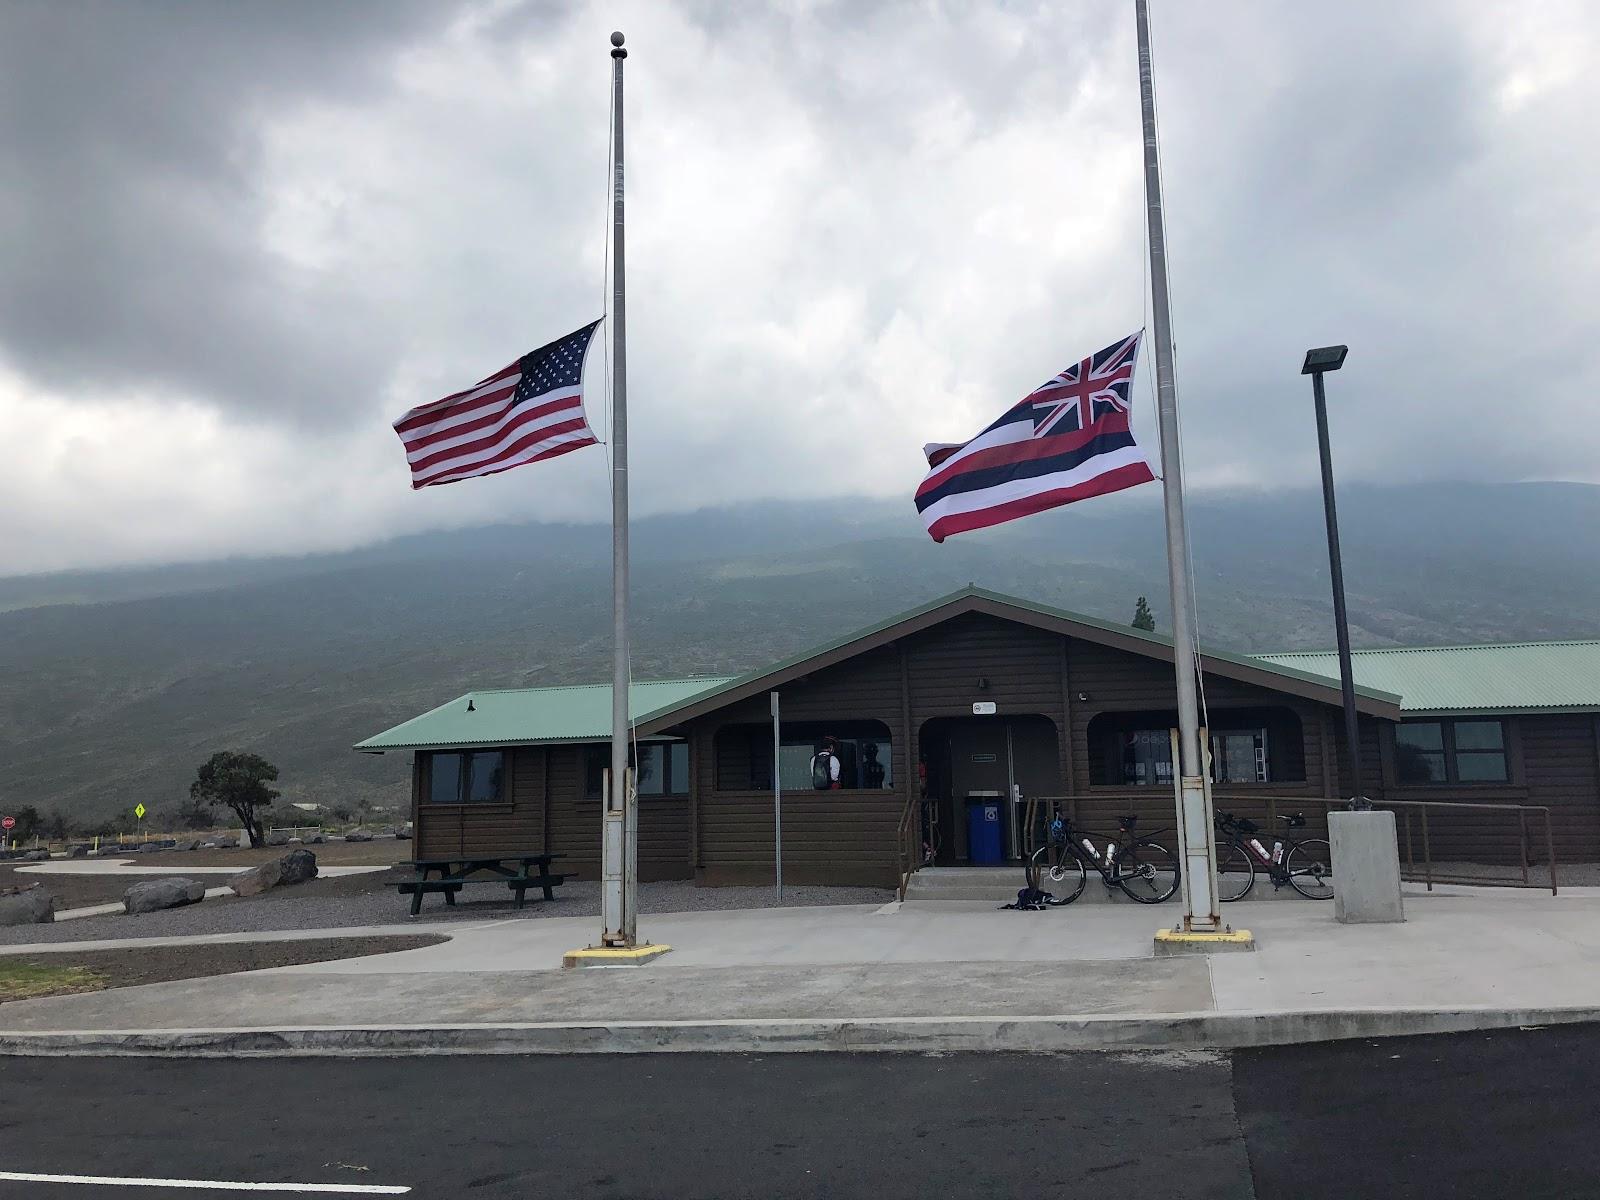 Climbing Mauna Loa by bike - Mauna Kea Park - flags and visitor center